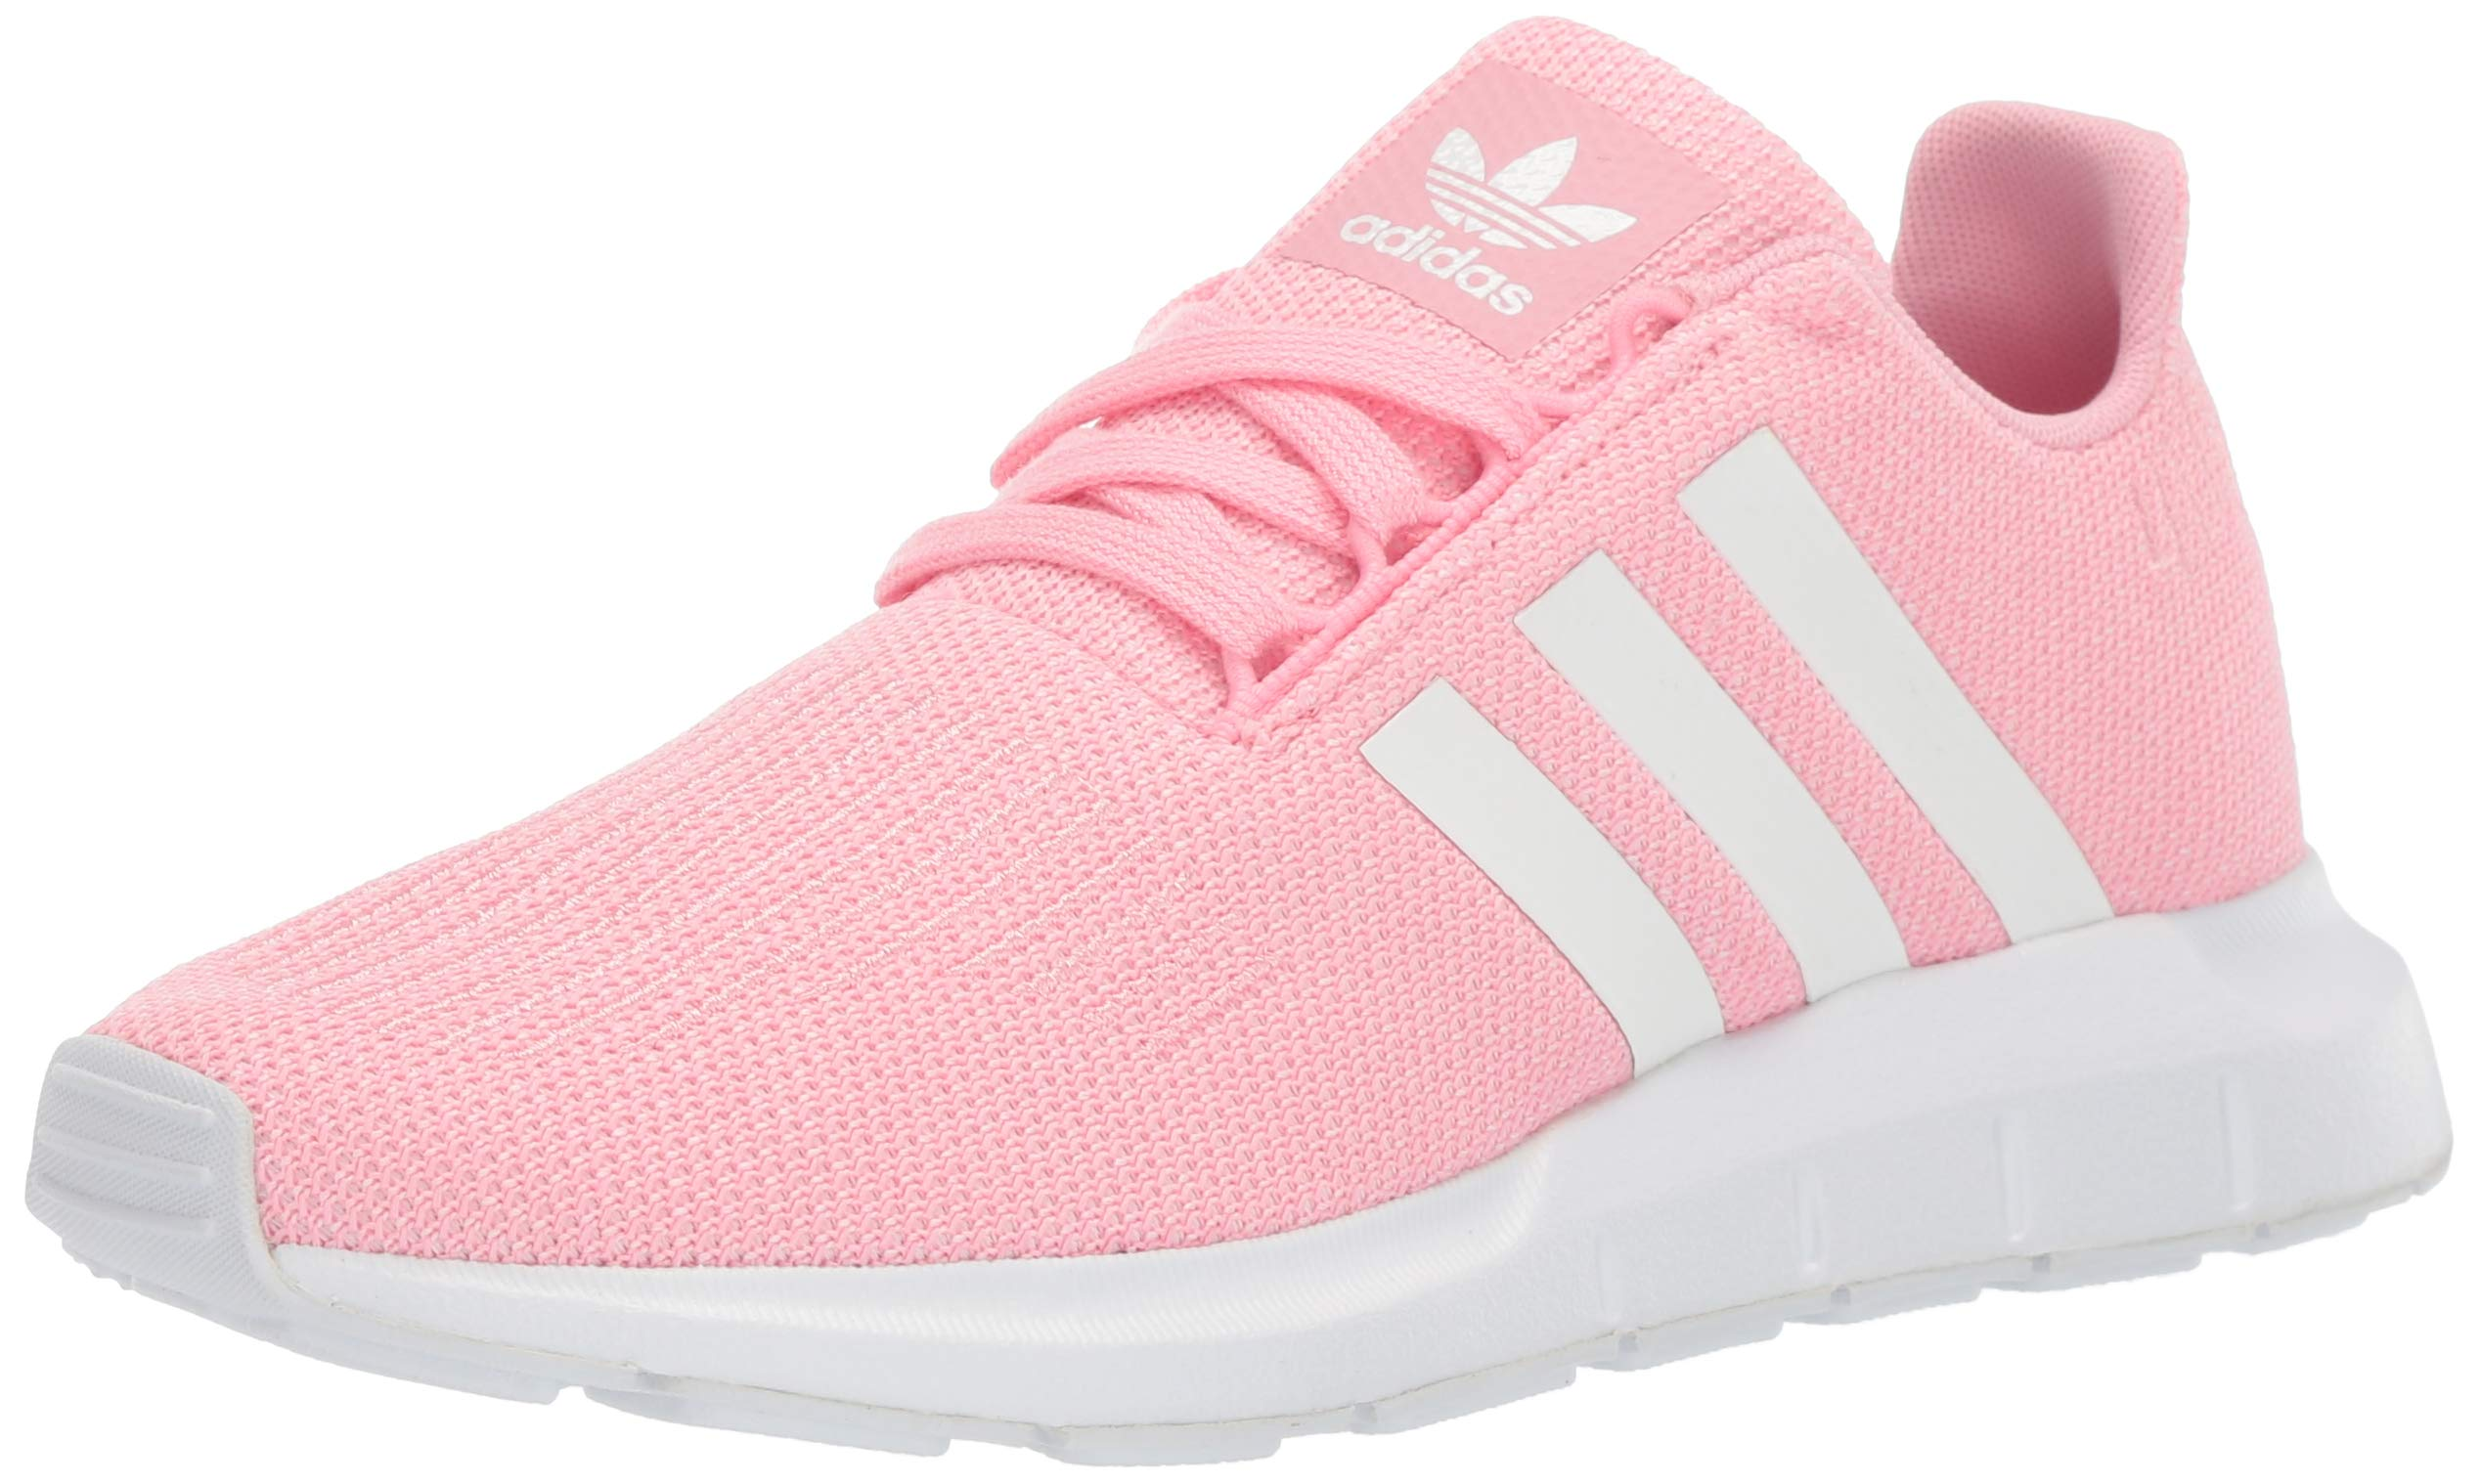 adidas Originals Unisex Swift Running Shoe Light Pink/White/White, 4 M US Big Kid